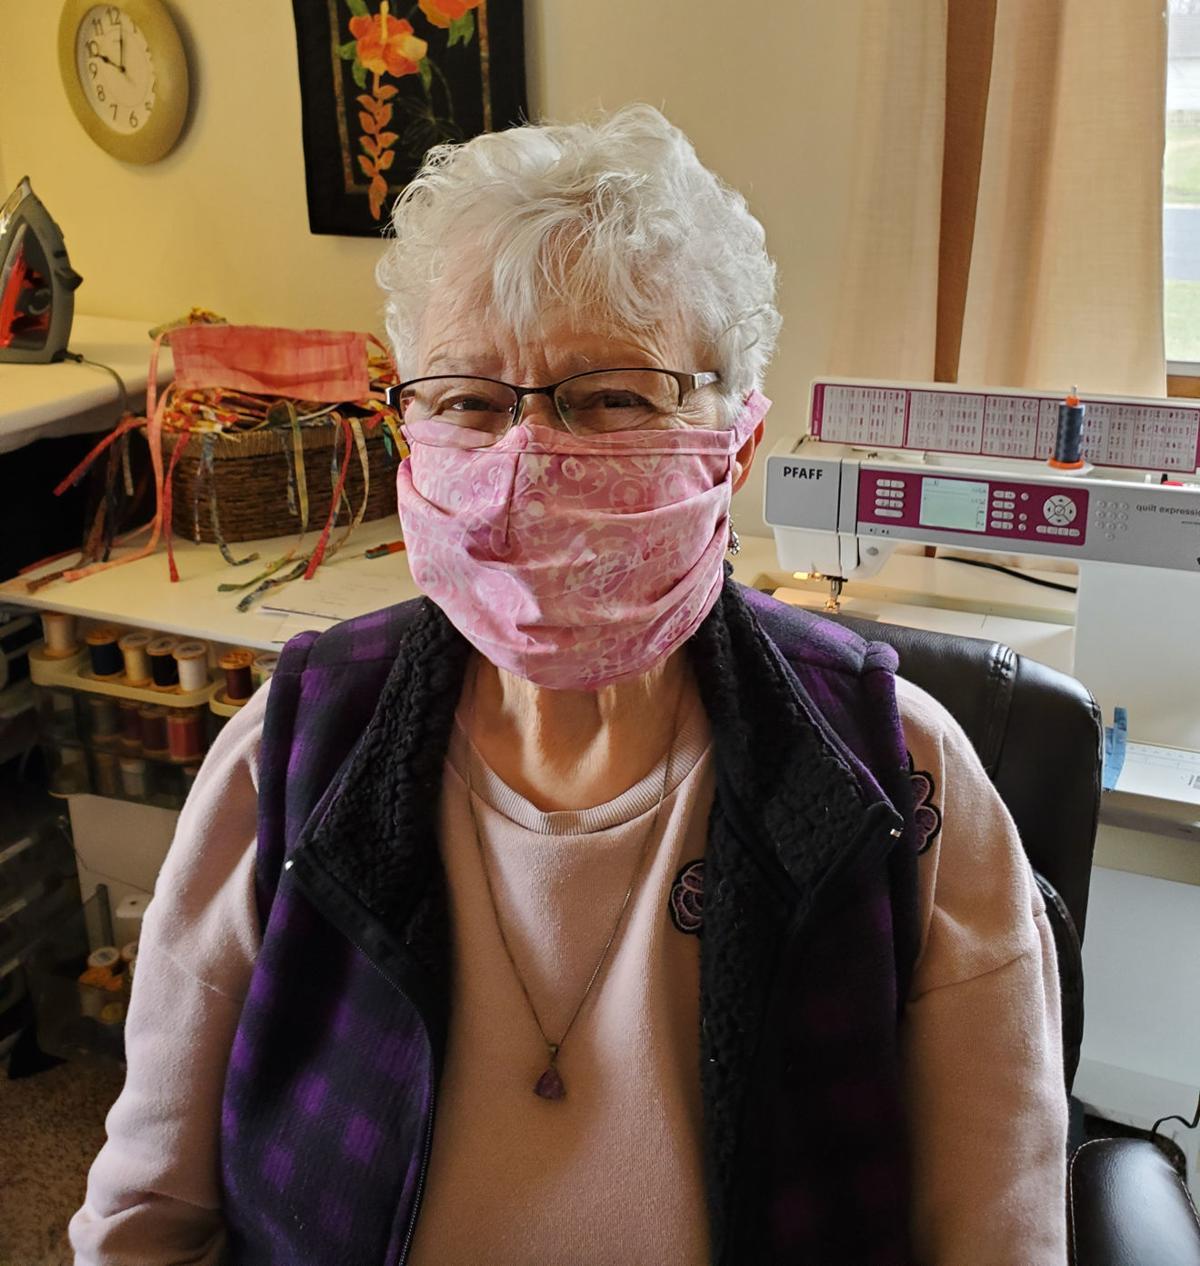 Cambridge quilters sew in-demand coronavirus face masks